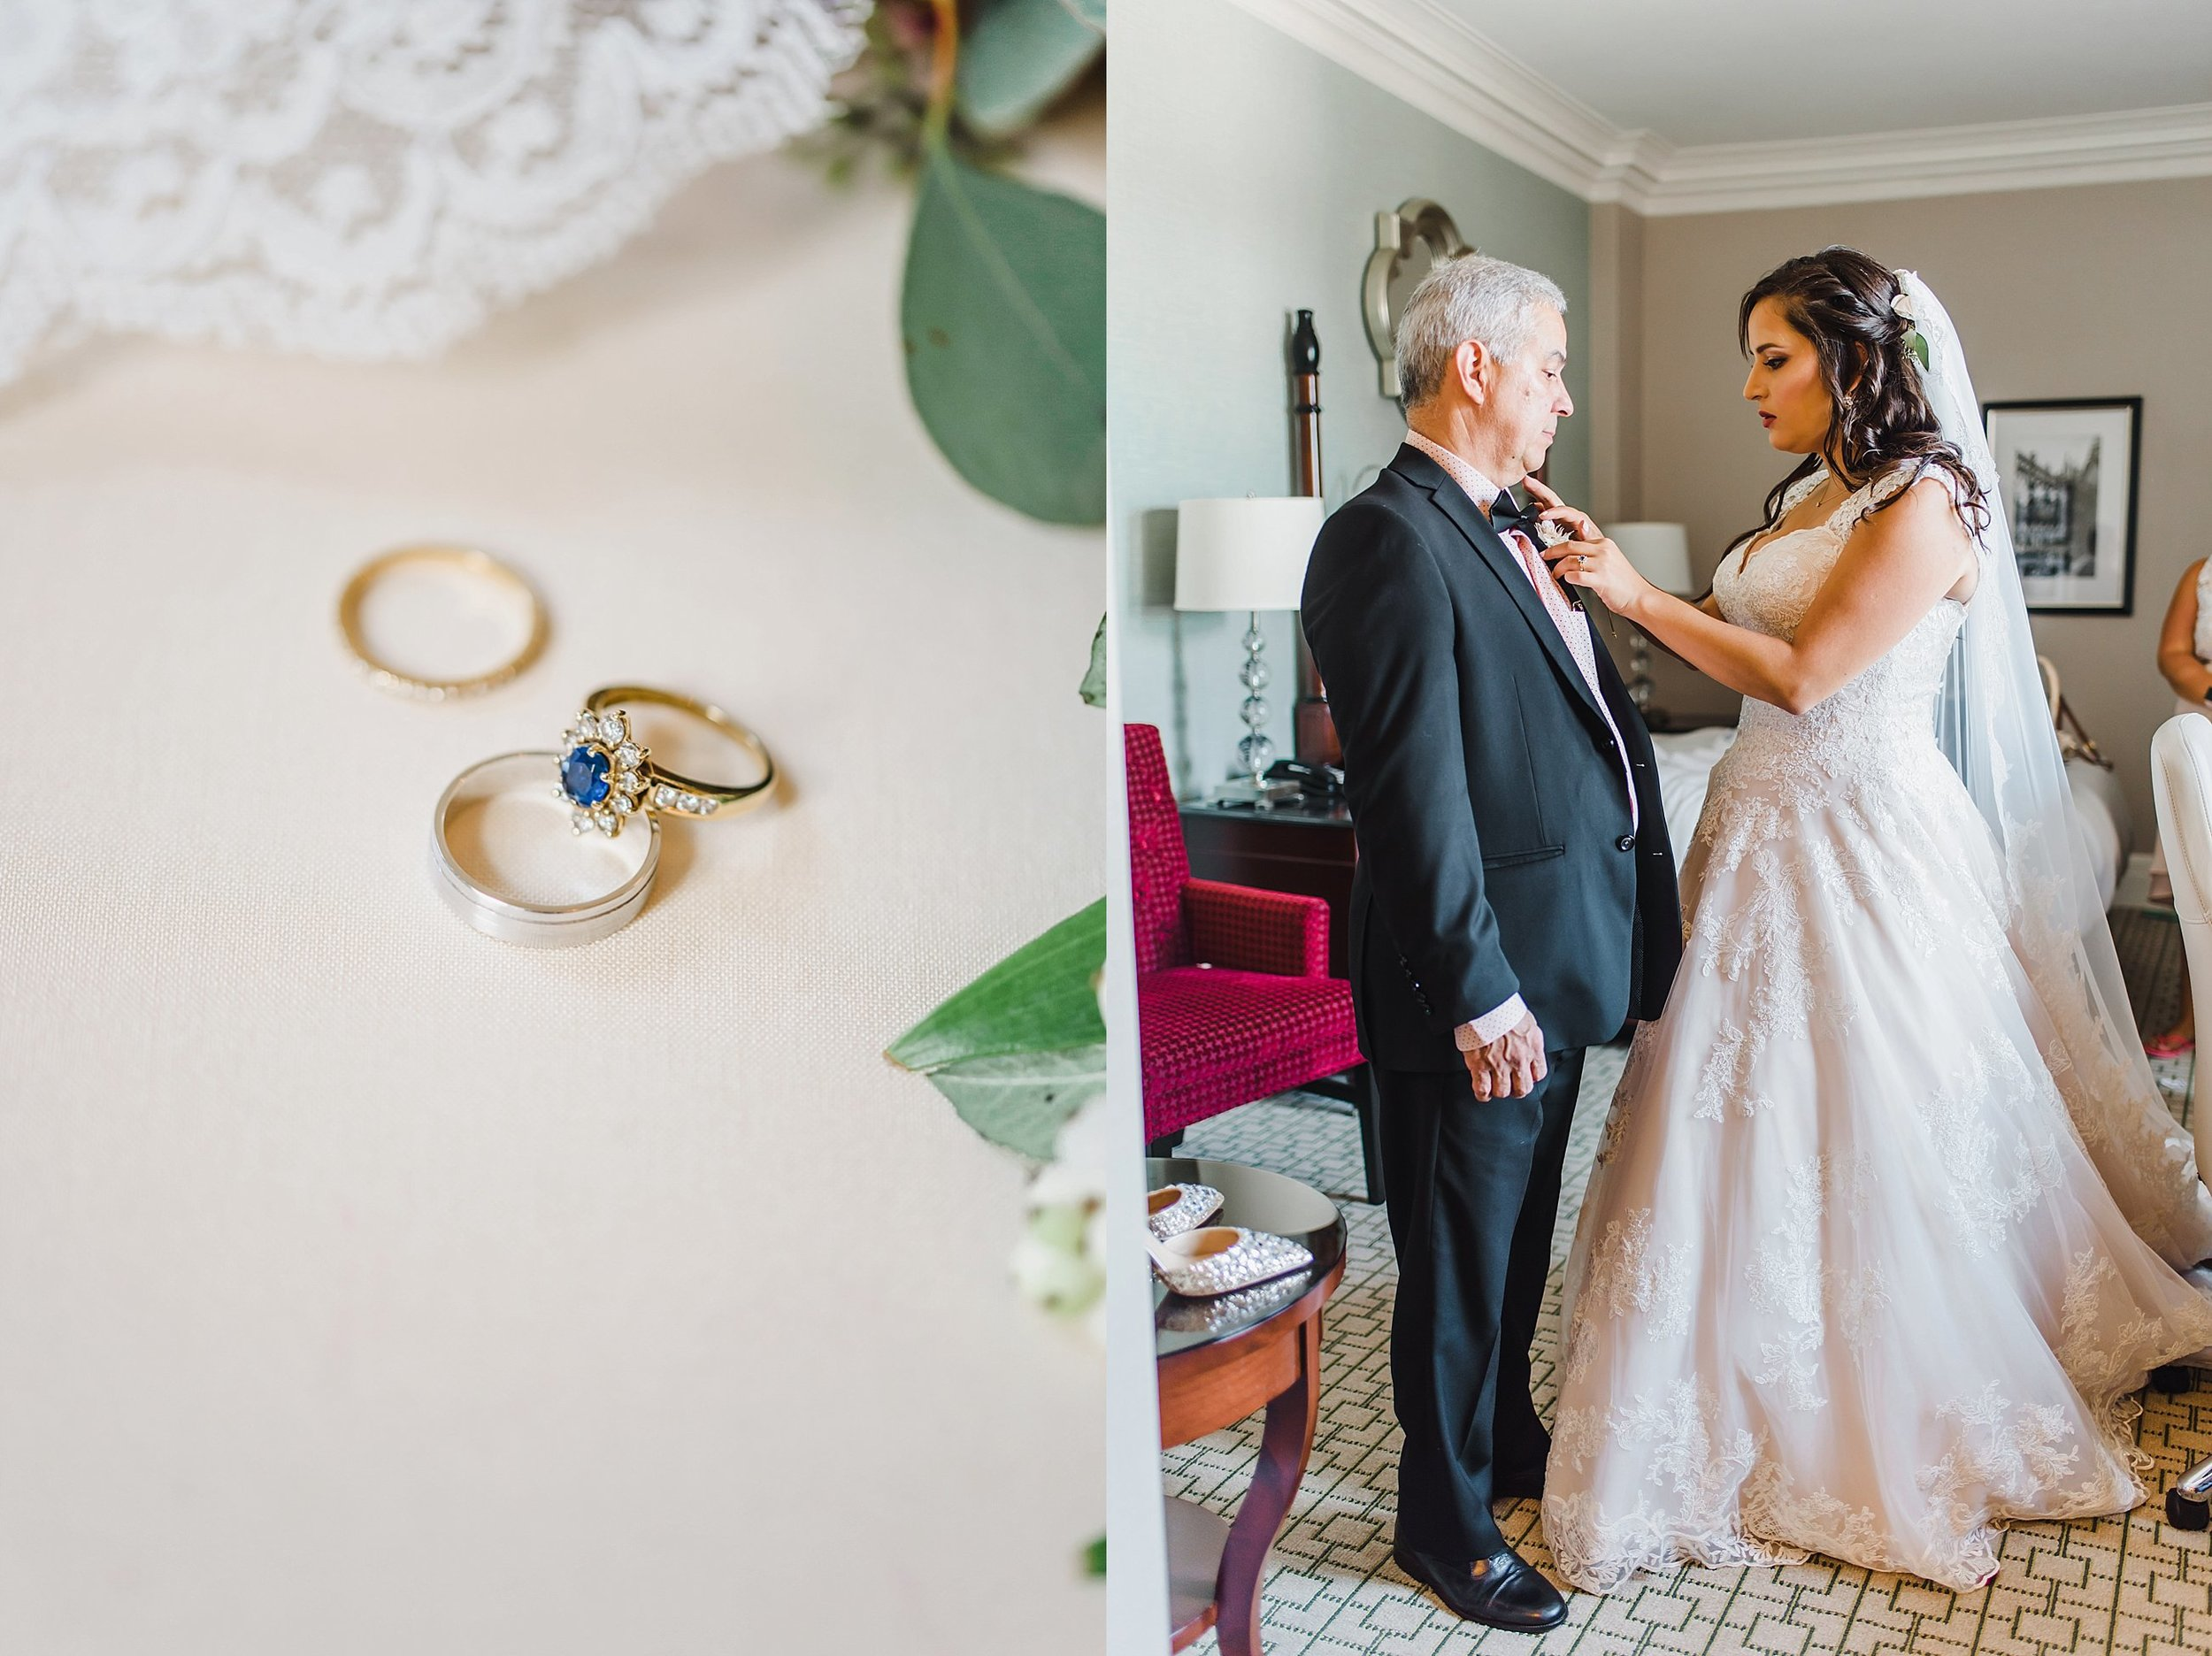 light airy indie fine art ottawa wedding photographer | Ali and Batoul Photography_1569.jpg